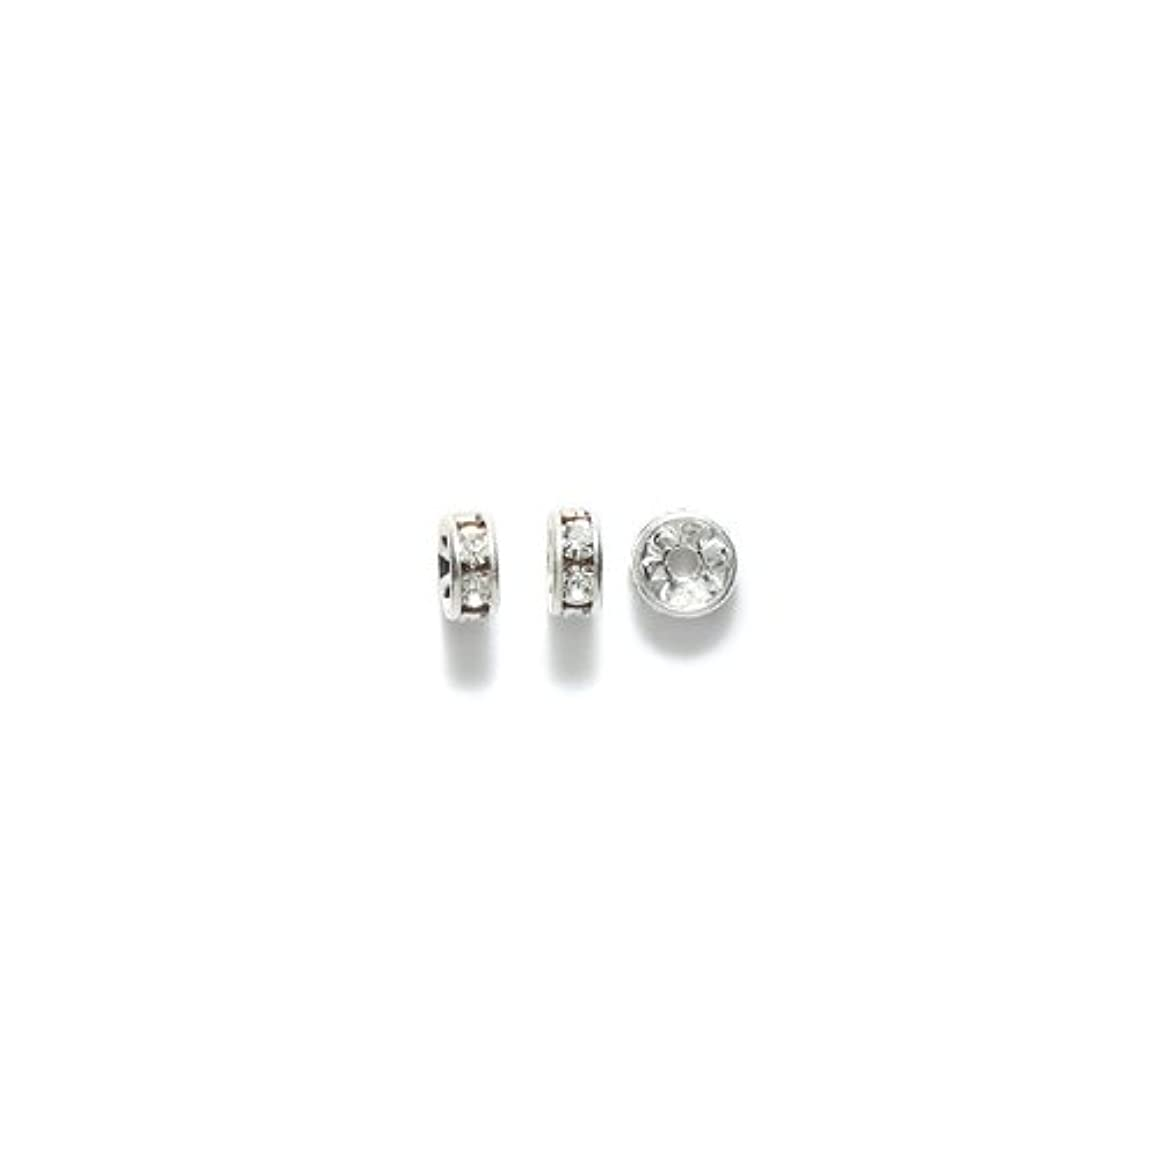 Preciosa Rhinestone Rondelle Beads, 6mm, Crystal, 36-Pack